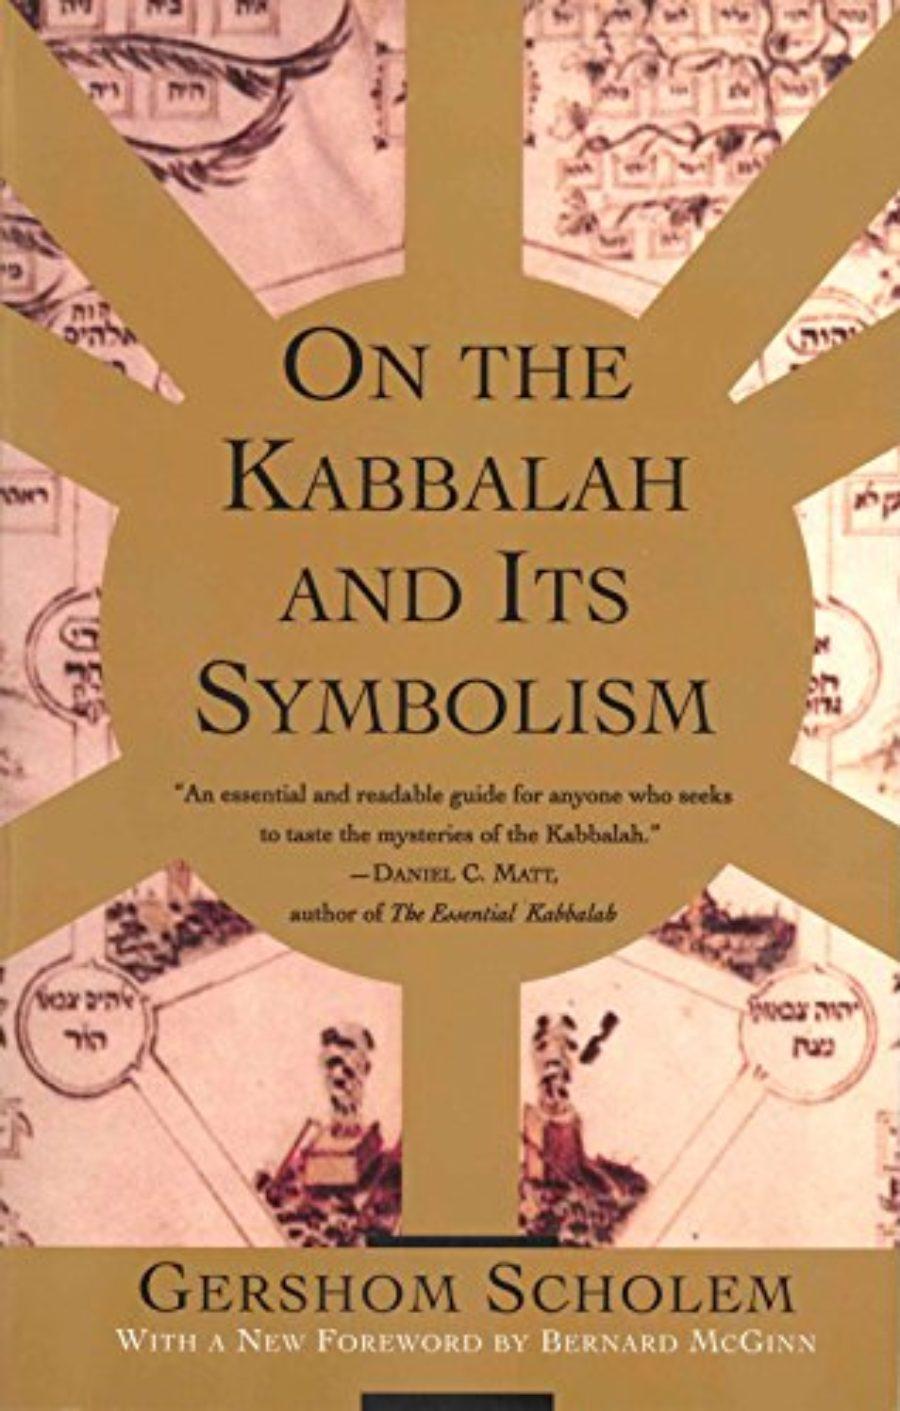 Cover of On the Kabbalah and its Symbolism (Mysticism and Kabbalah)